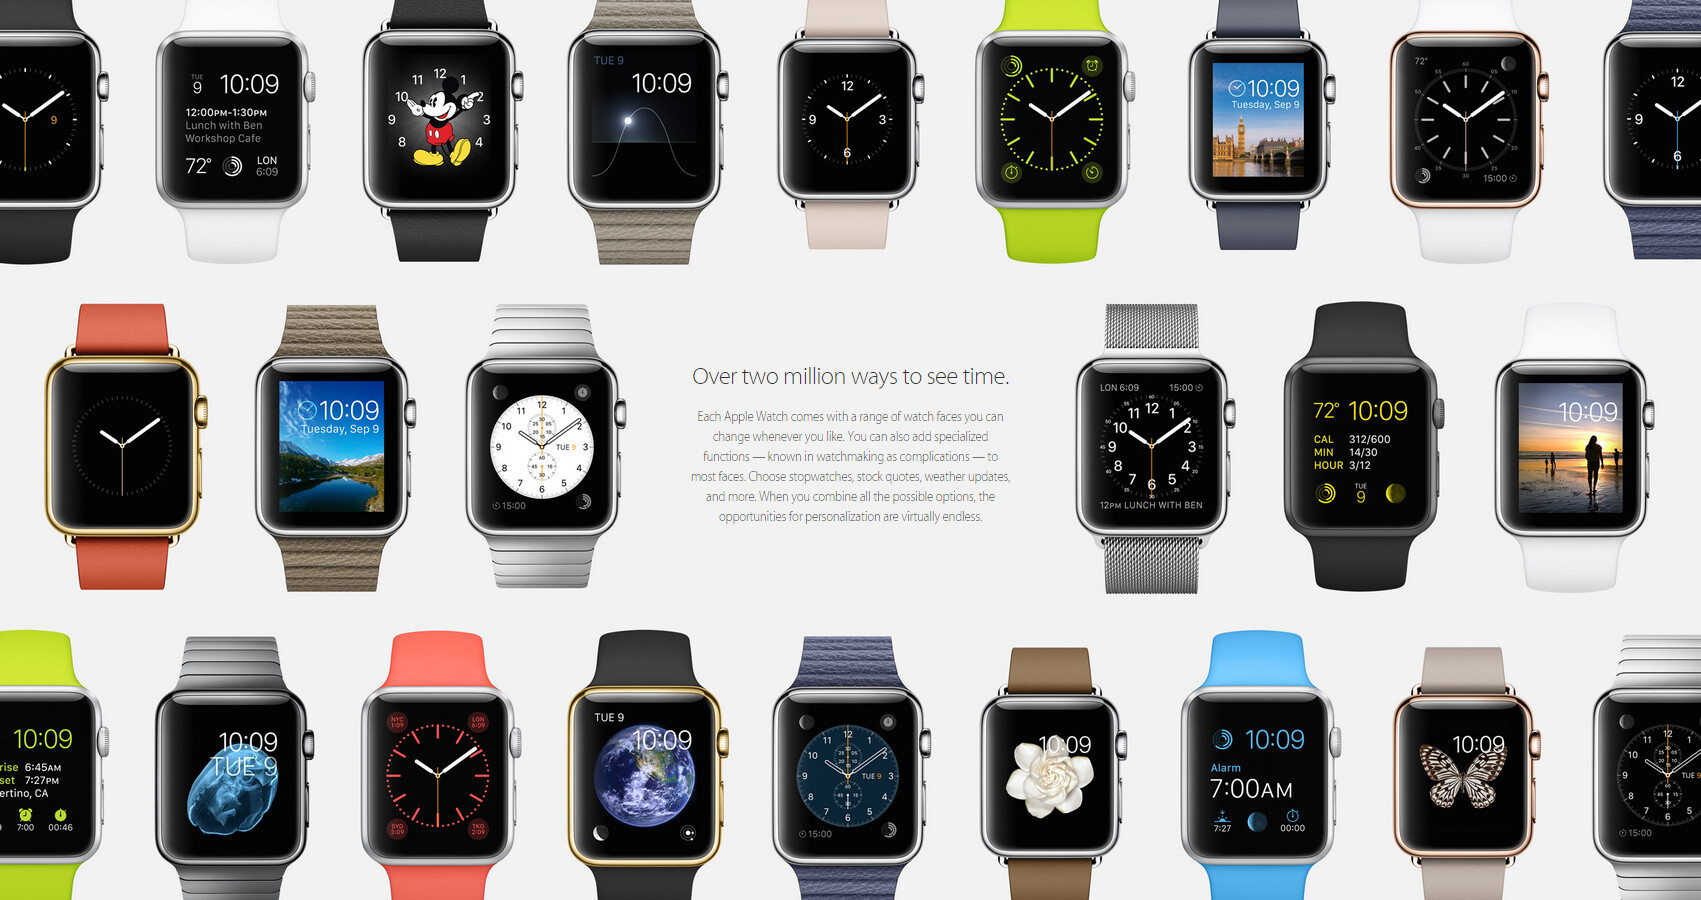 netzwelt gadgets apple watch besten apps